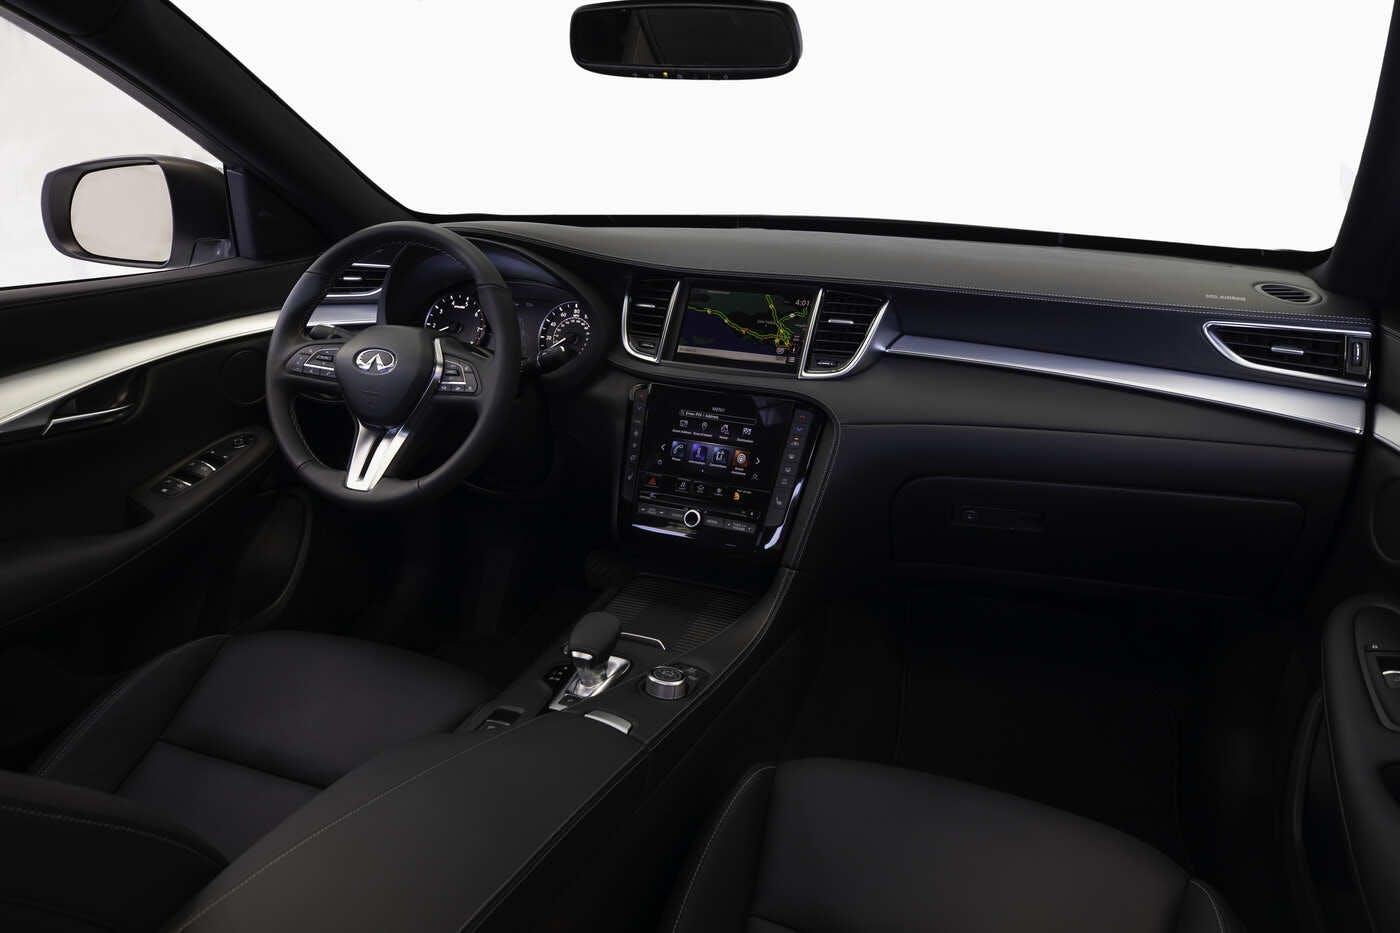 2020 Infiniti Qx50 Comparisons Reviews Pictures Truecar